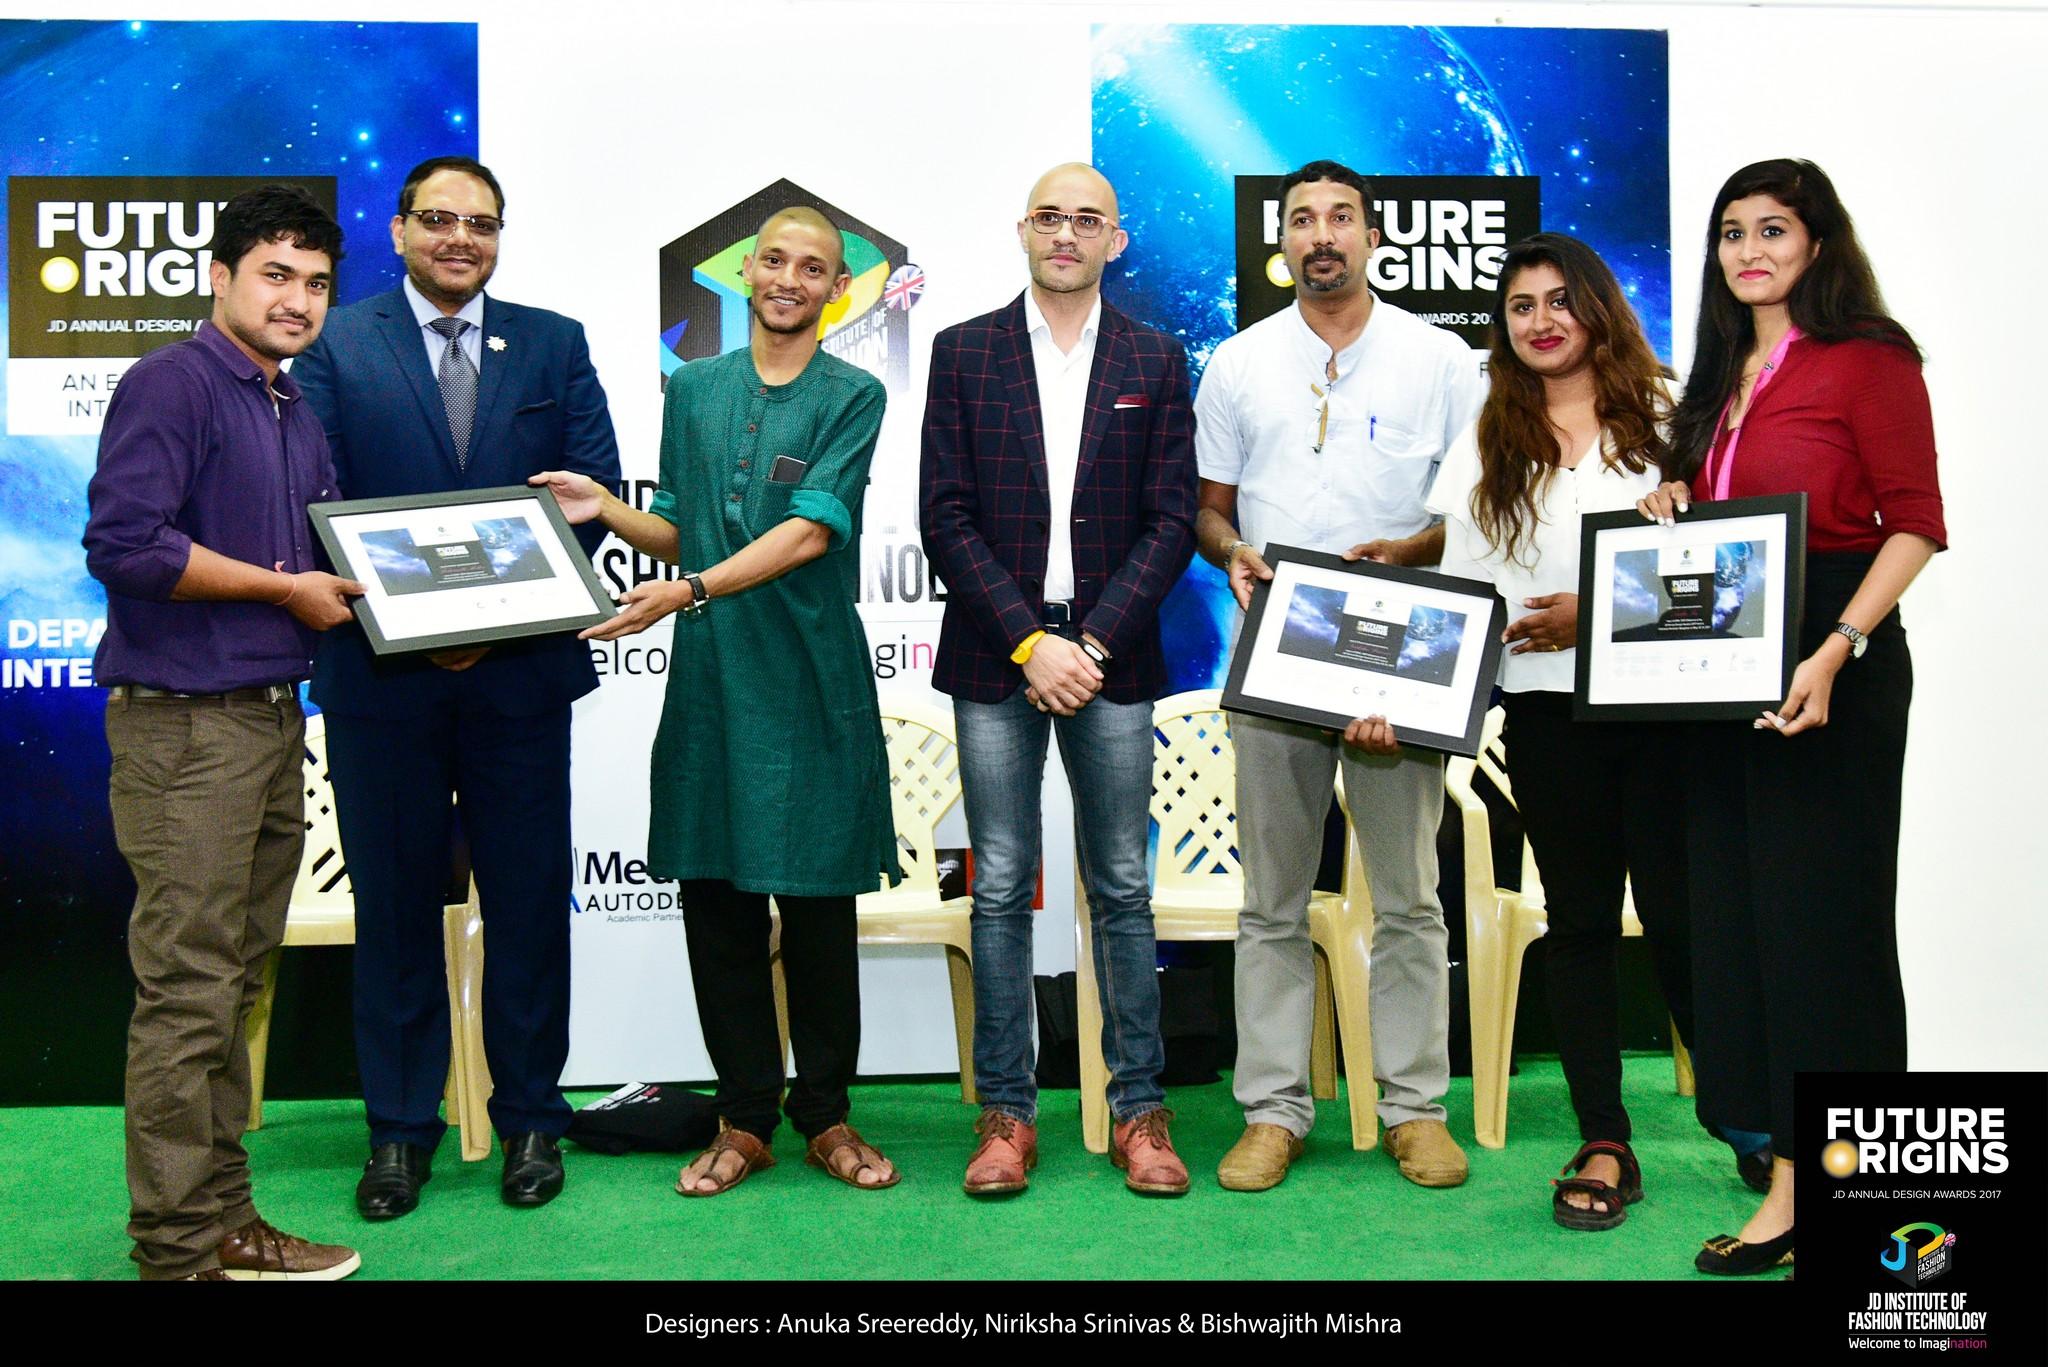 Fangled – Future Origin – JD Annual Design Awards 2017 - Interior Design | Photography : Jerin Nath (@jerin_nath) fangled - Fangled     Future Origin     JD Annual Design Awards 2017 3 - Fangled – Future Origin – JD Annual Design Awards 2017